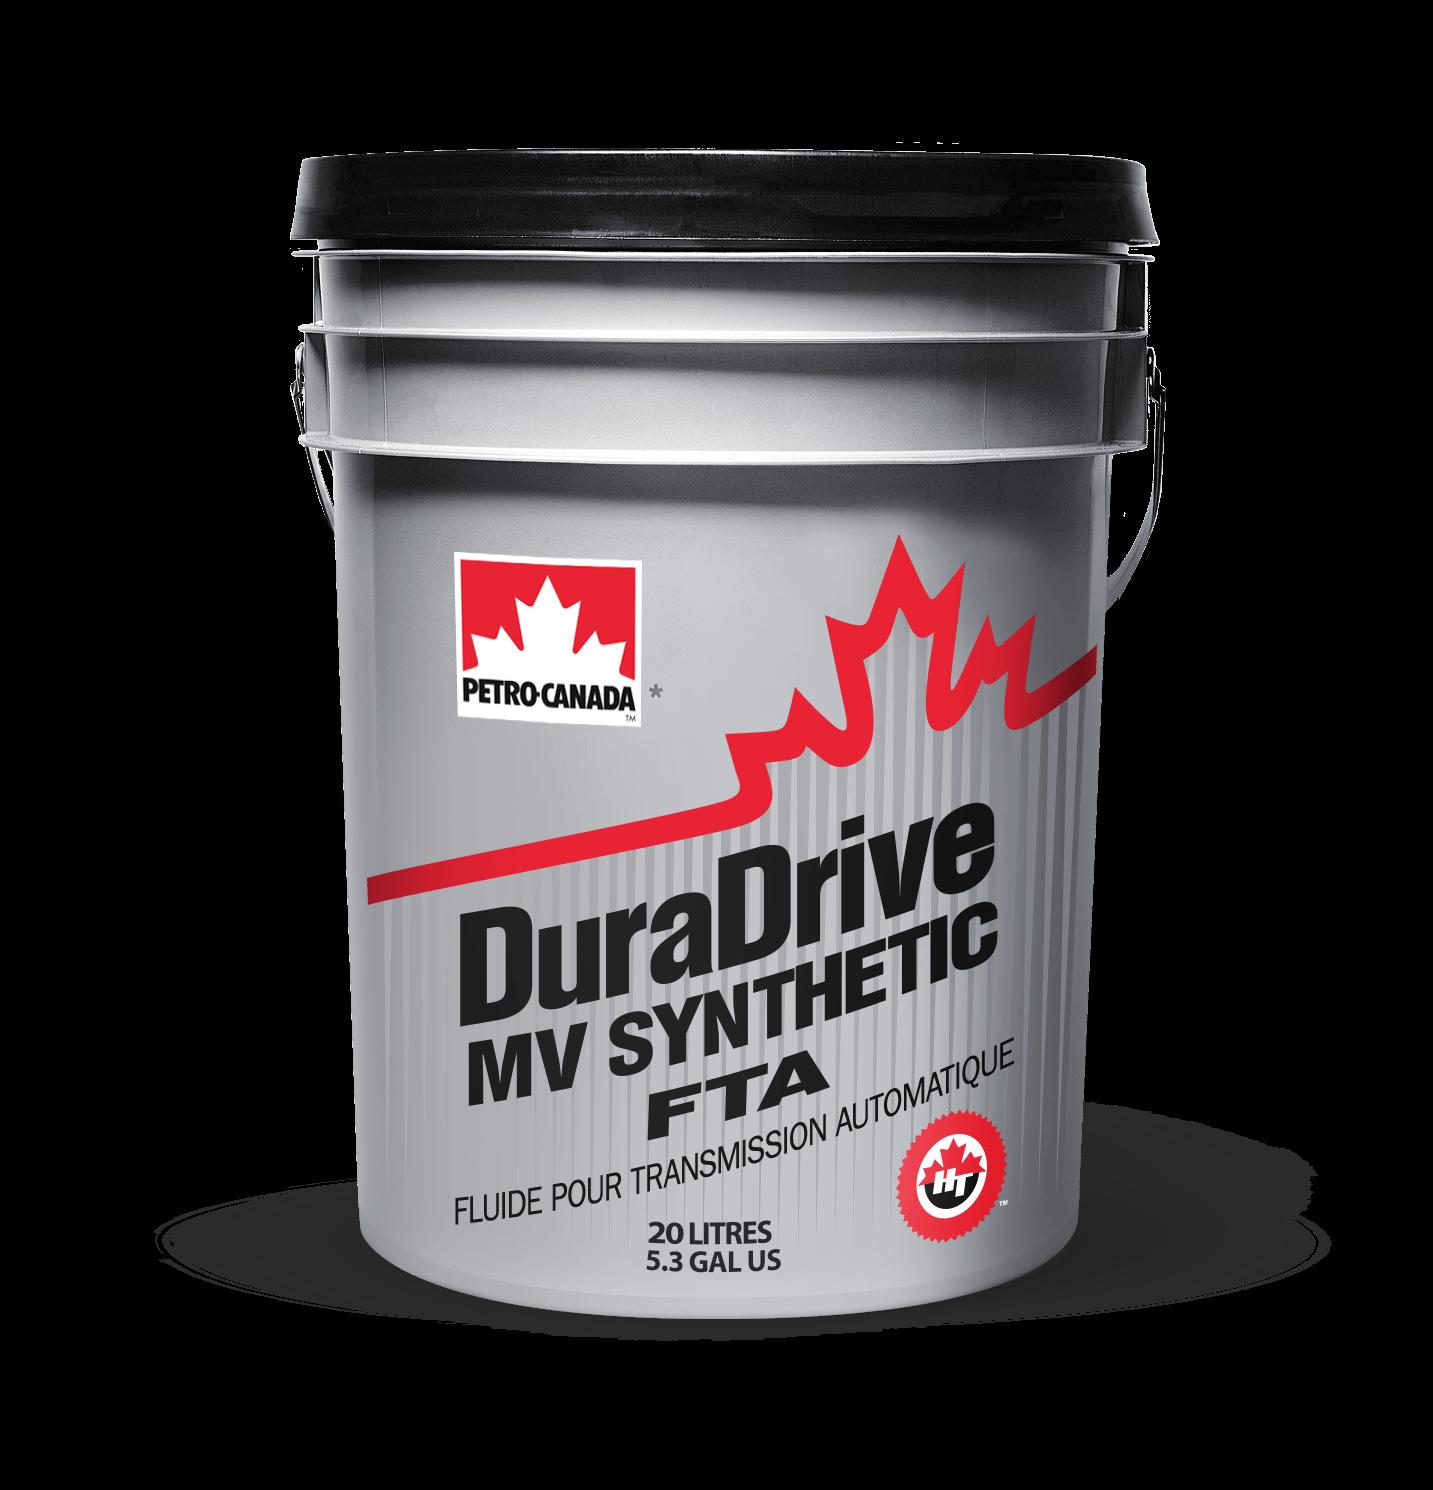 Petro-Canada Duradrive MV Syn  ATF